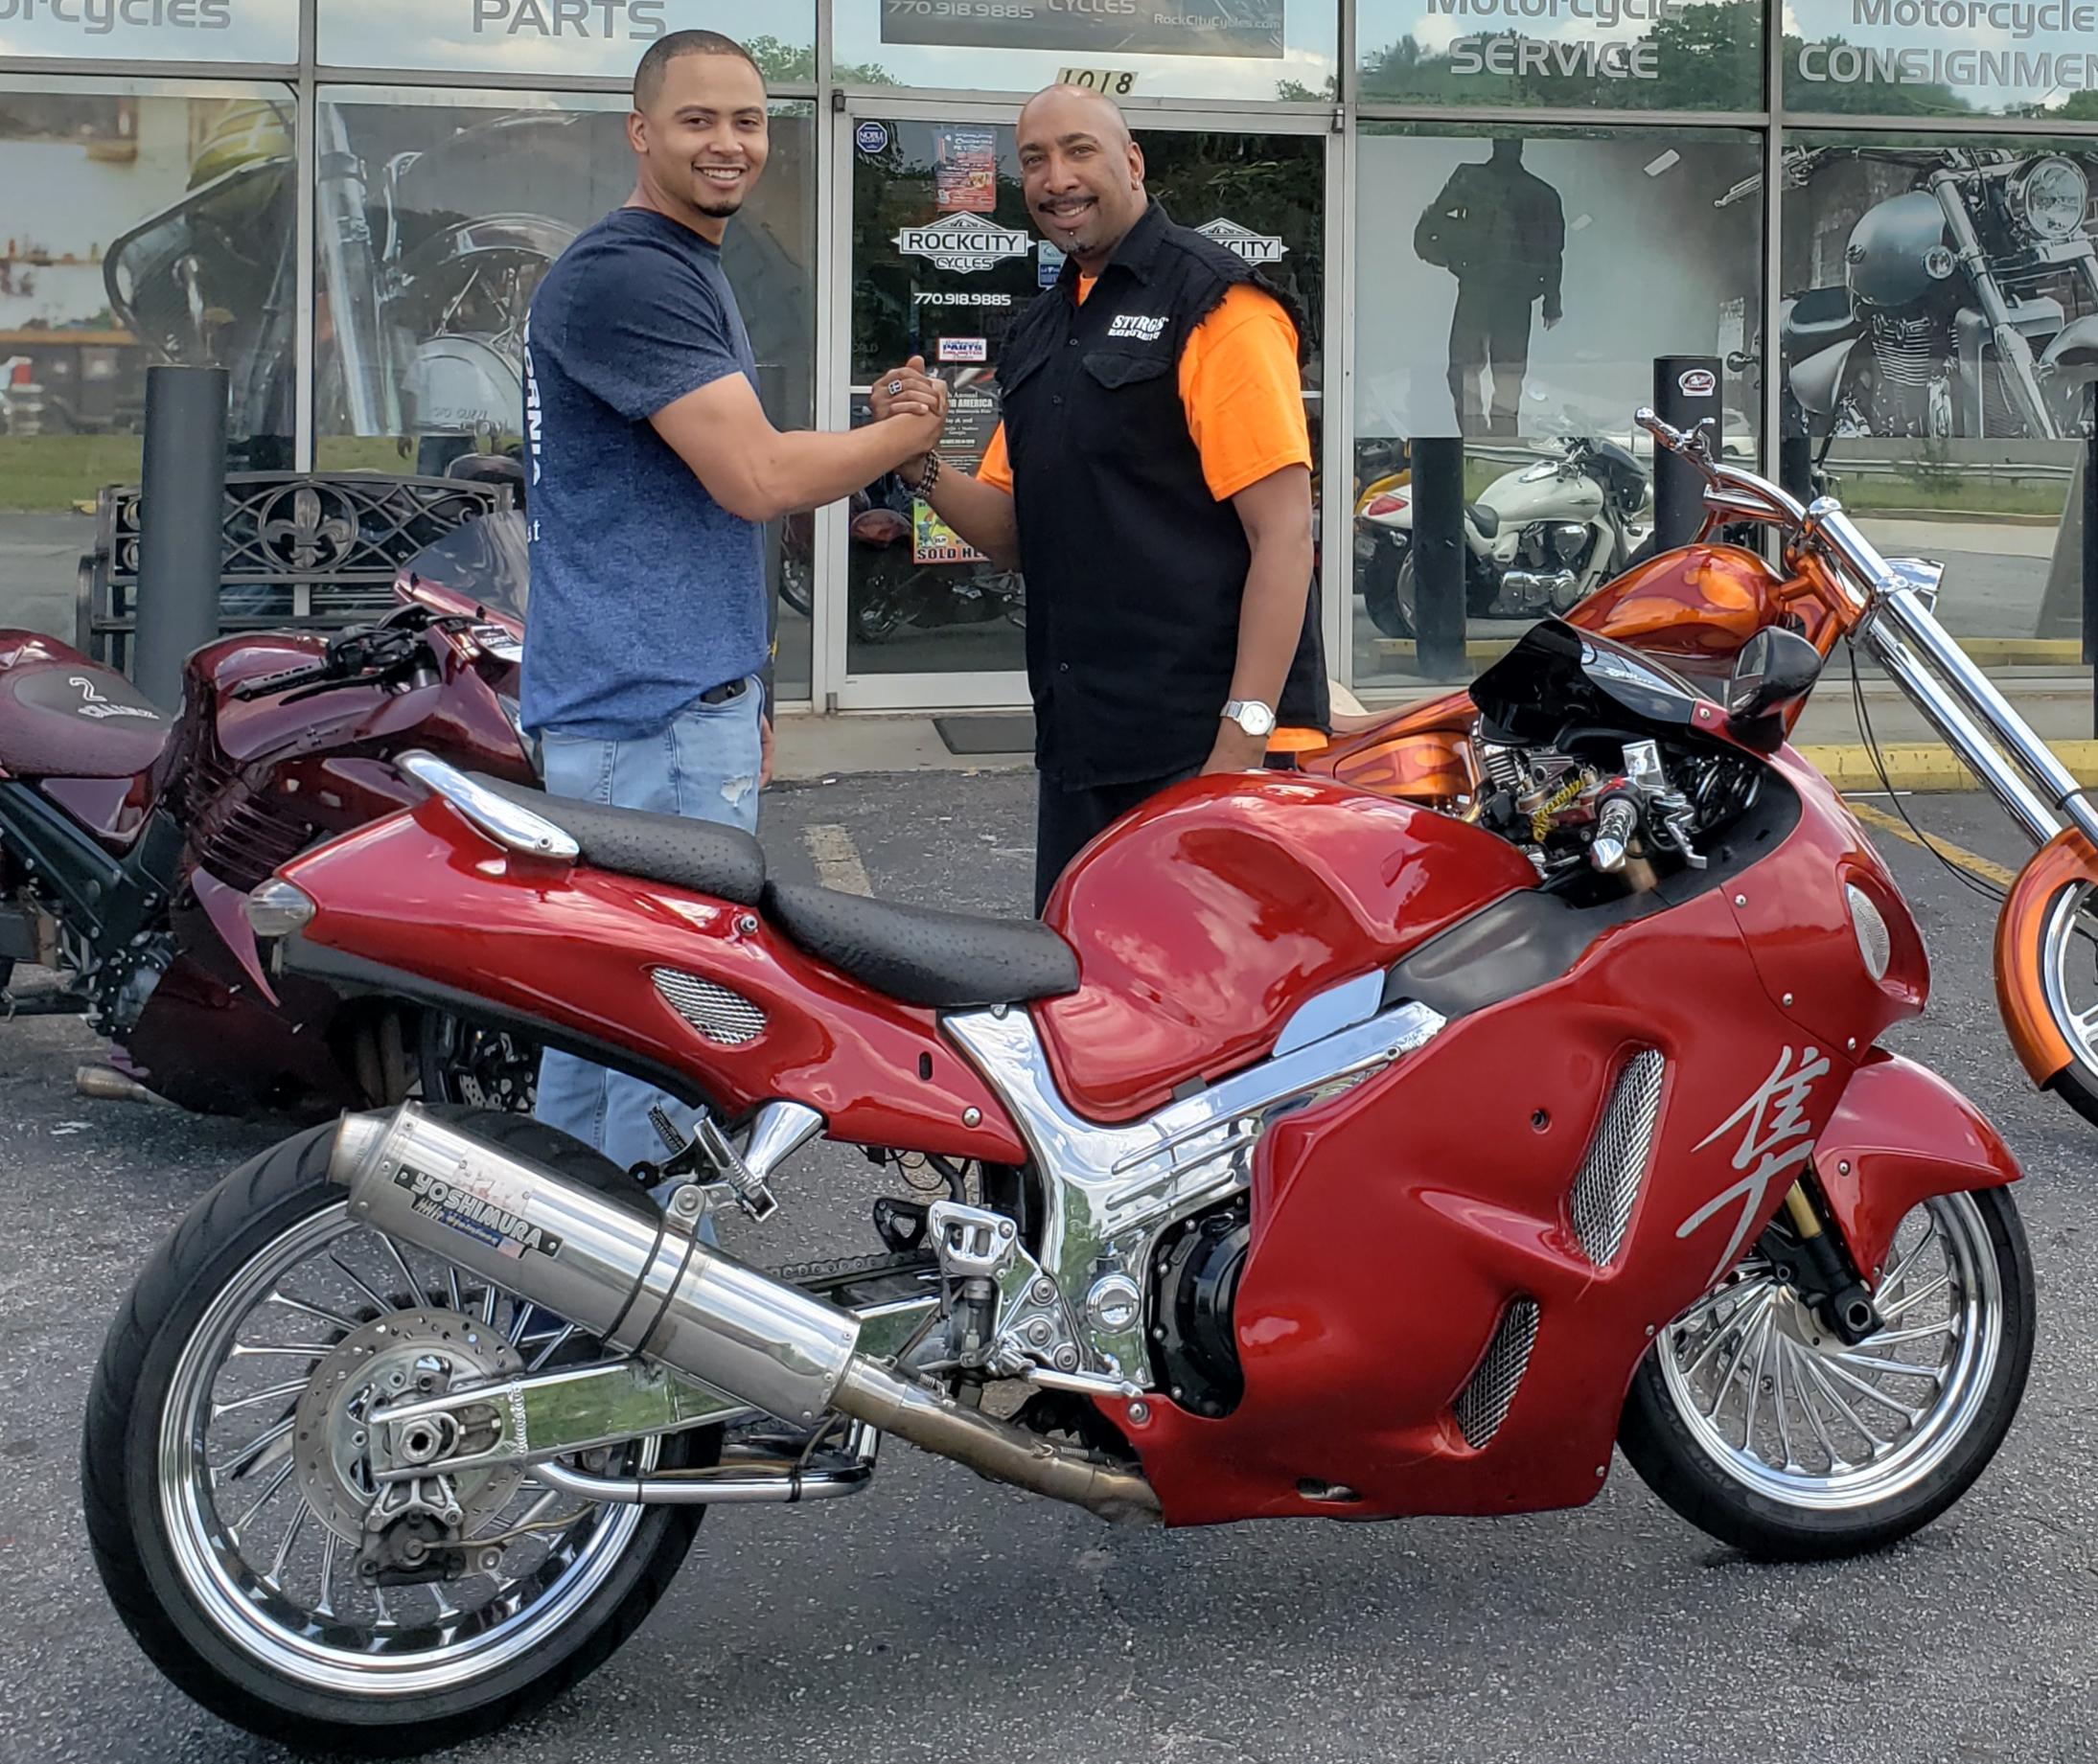 Bobby H. with his 2001 Suzuki Hayabusa GSX-R1300